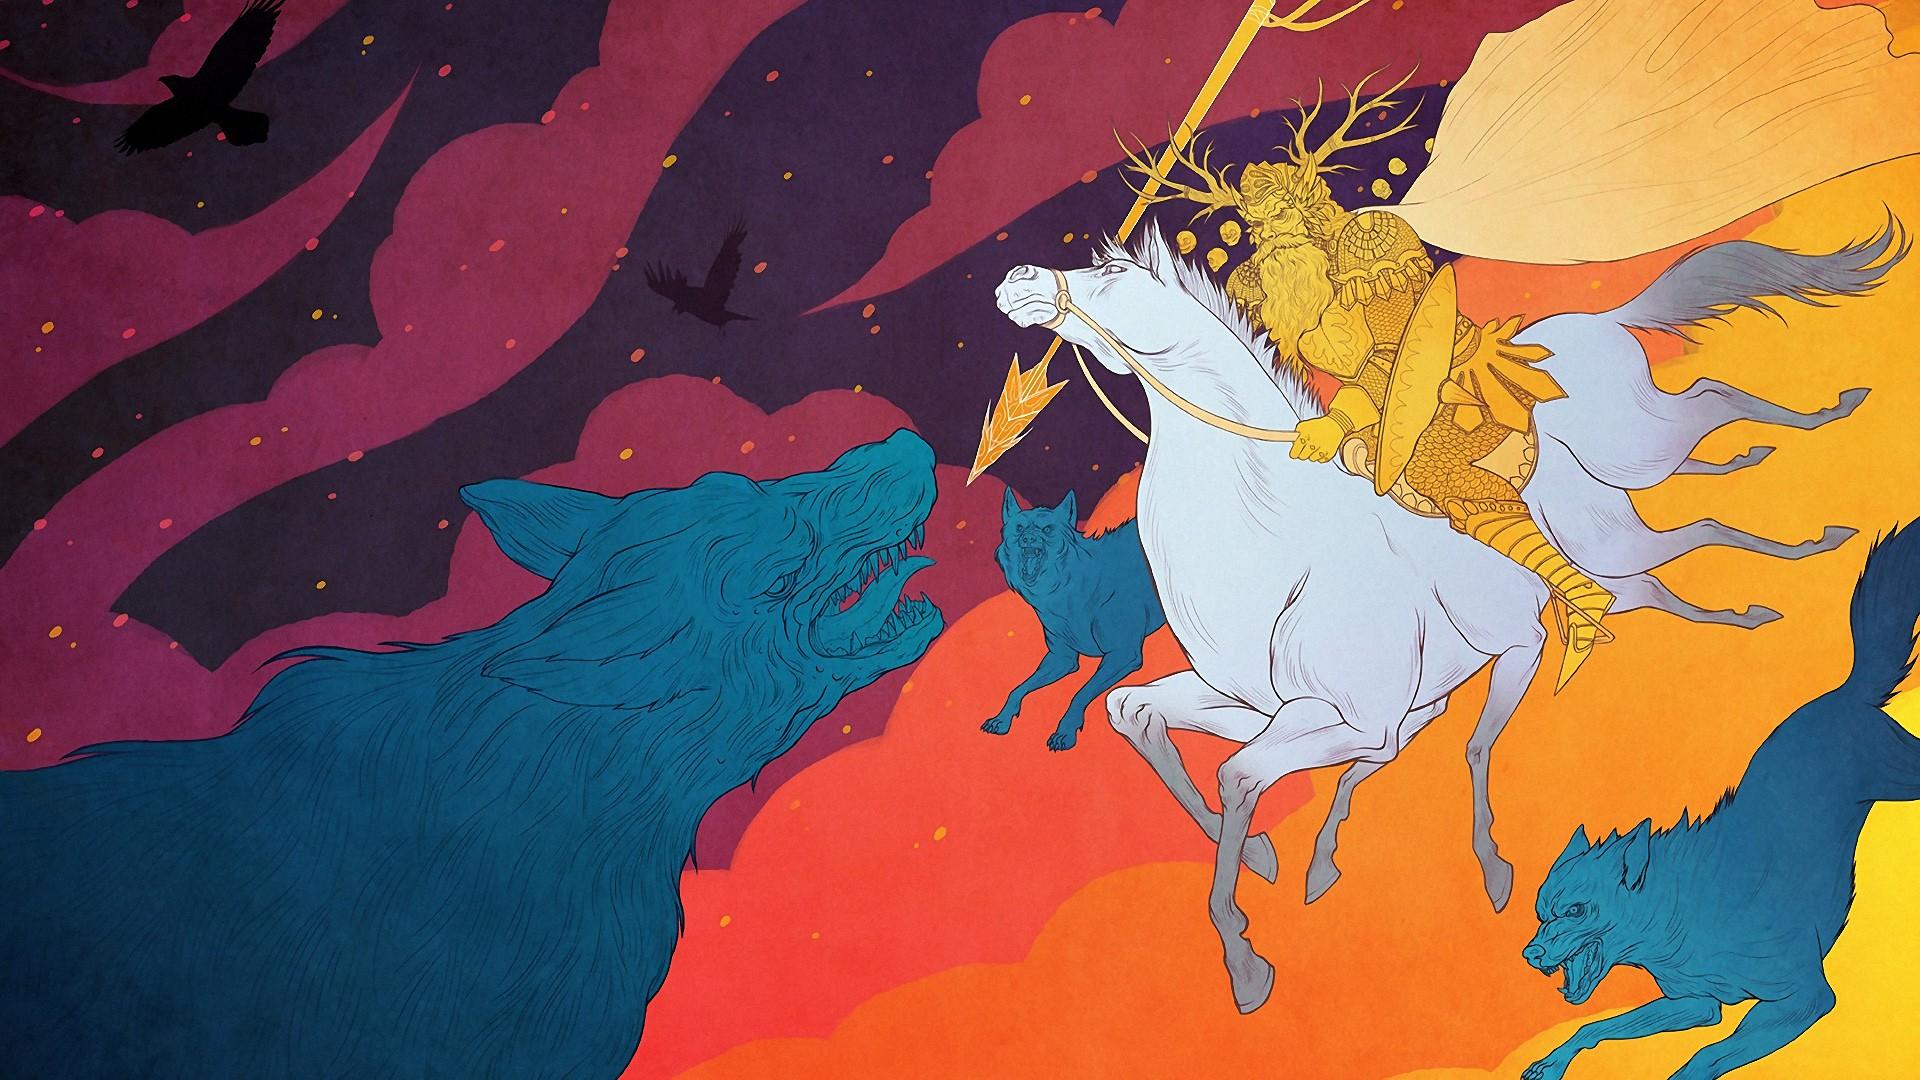 General 1920x1080 horse riding Odin Odin Huginn Muninn Fenris Sleipnir Huginn Muninn Gungnir Sleipnir Fenris digital art wolf warrior painting Odin Vikings artwork colorful raven horse mythology